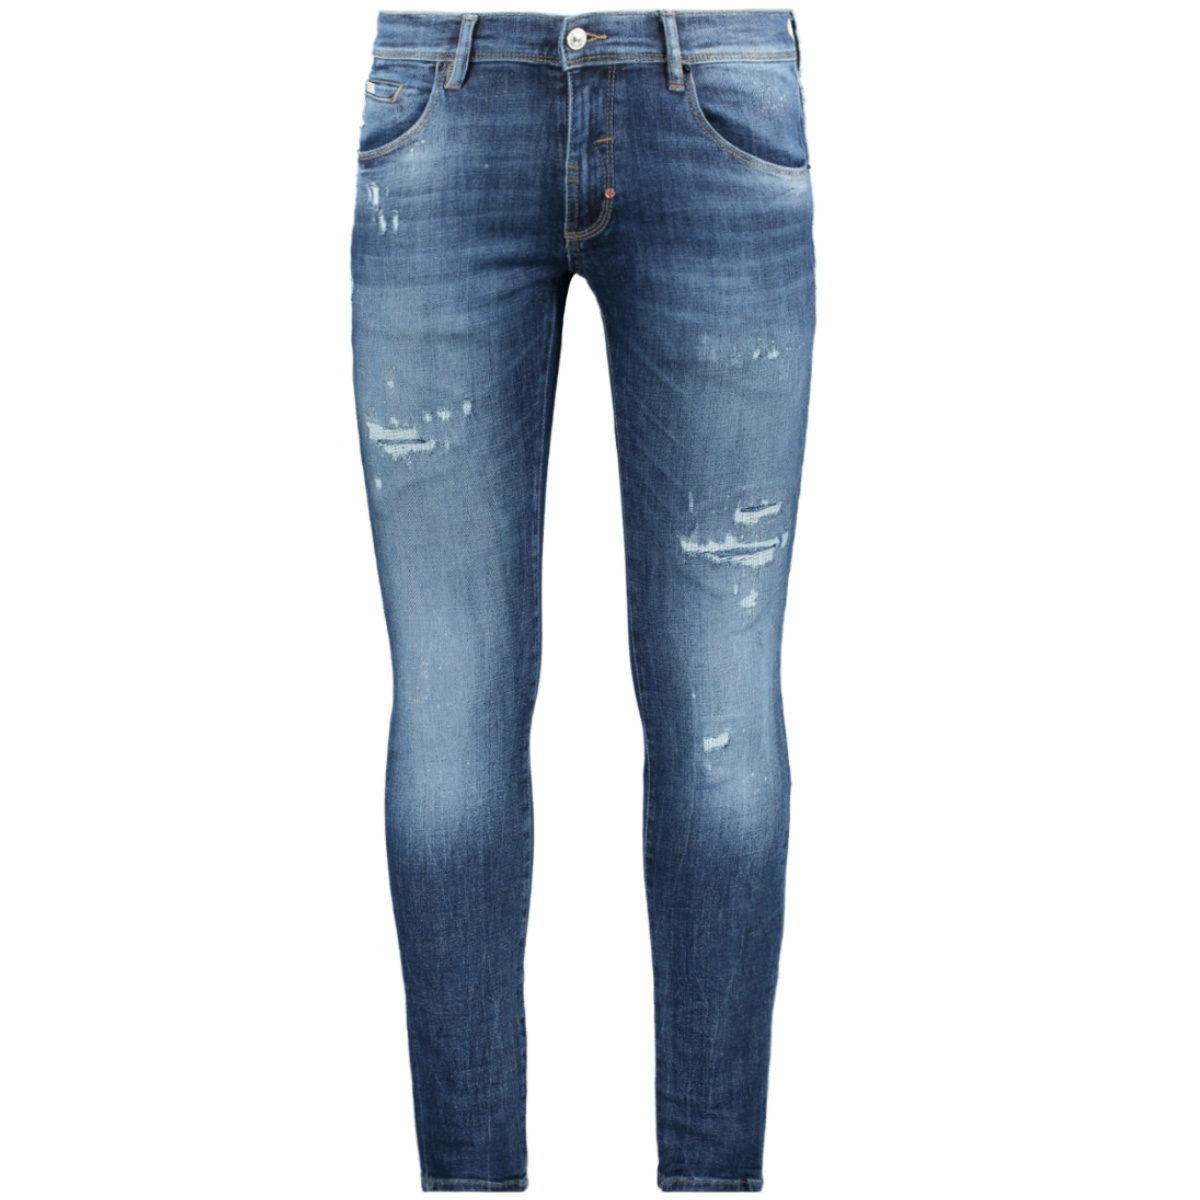 jeans super skinny mmdt00235 antony morato jeans blue denim